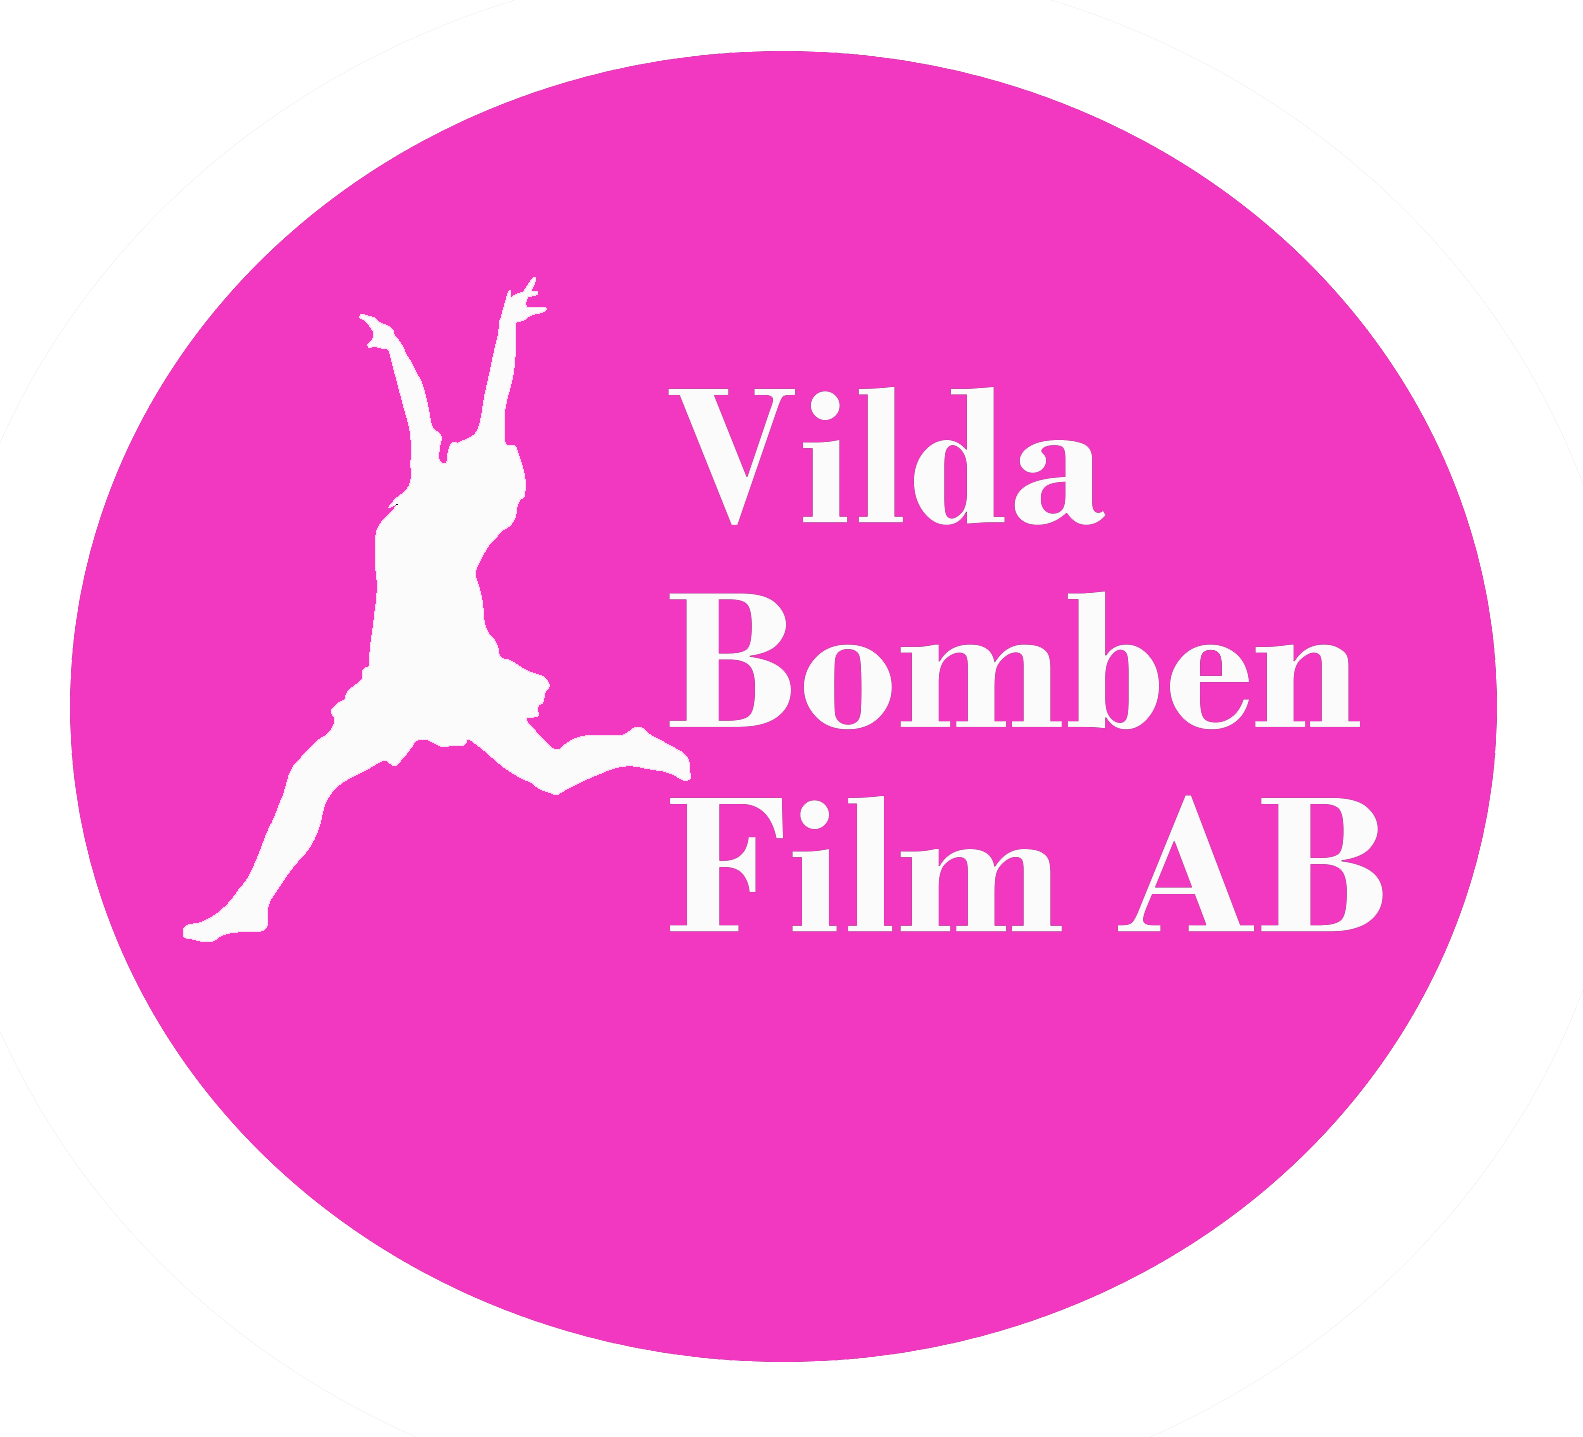 Vilda Bomben Film AB